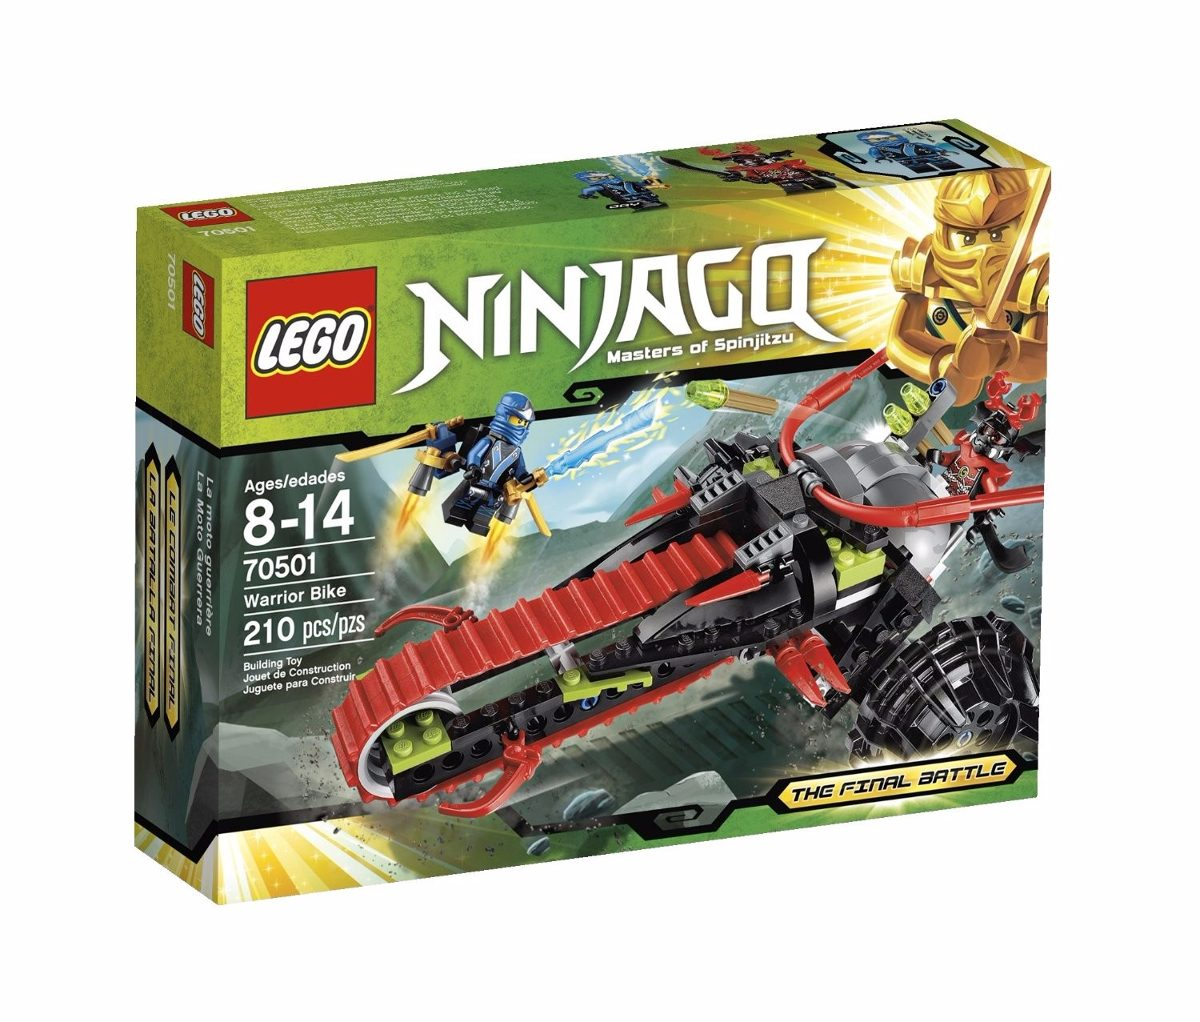 Ninjago Bs.To